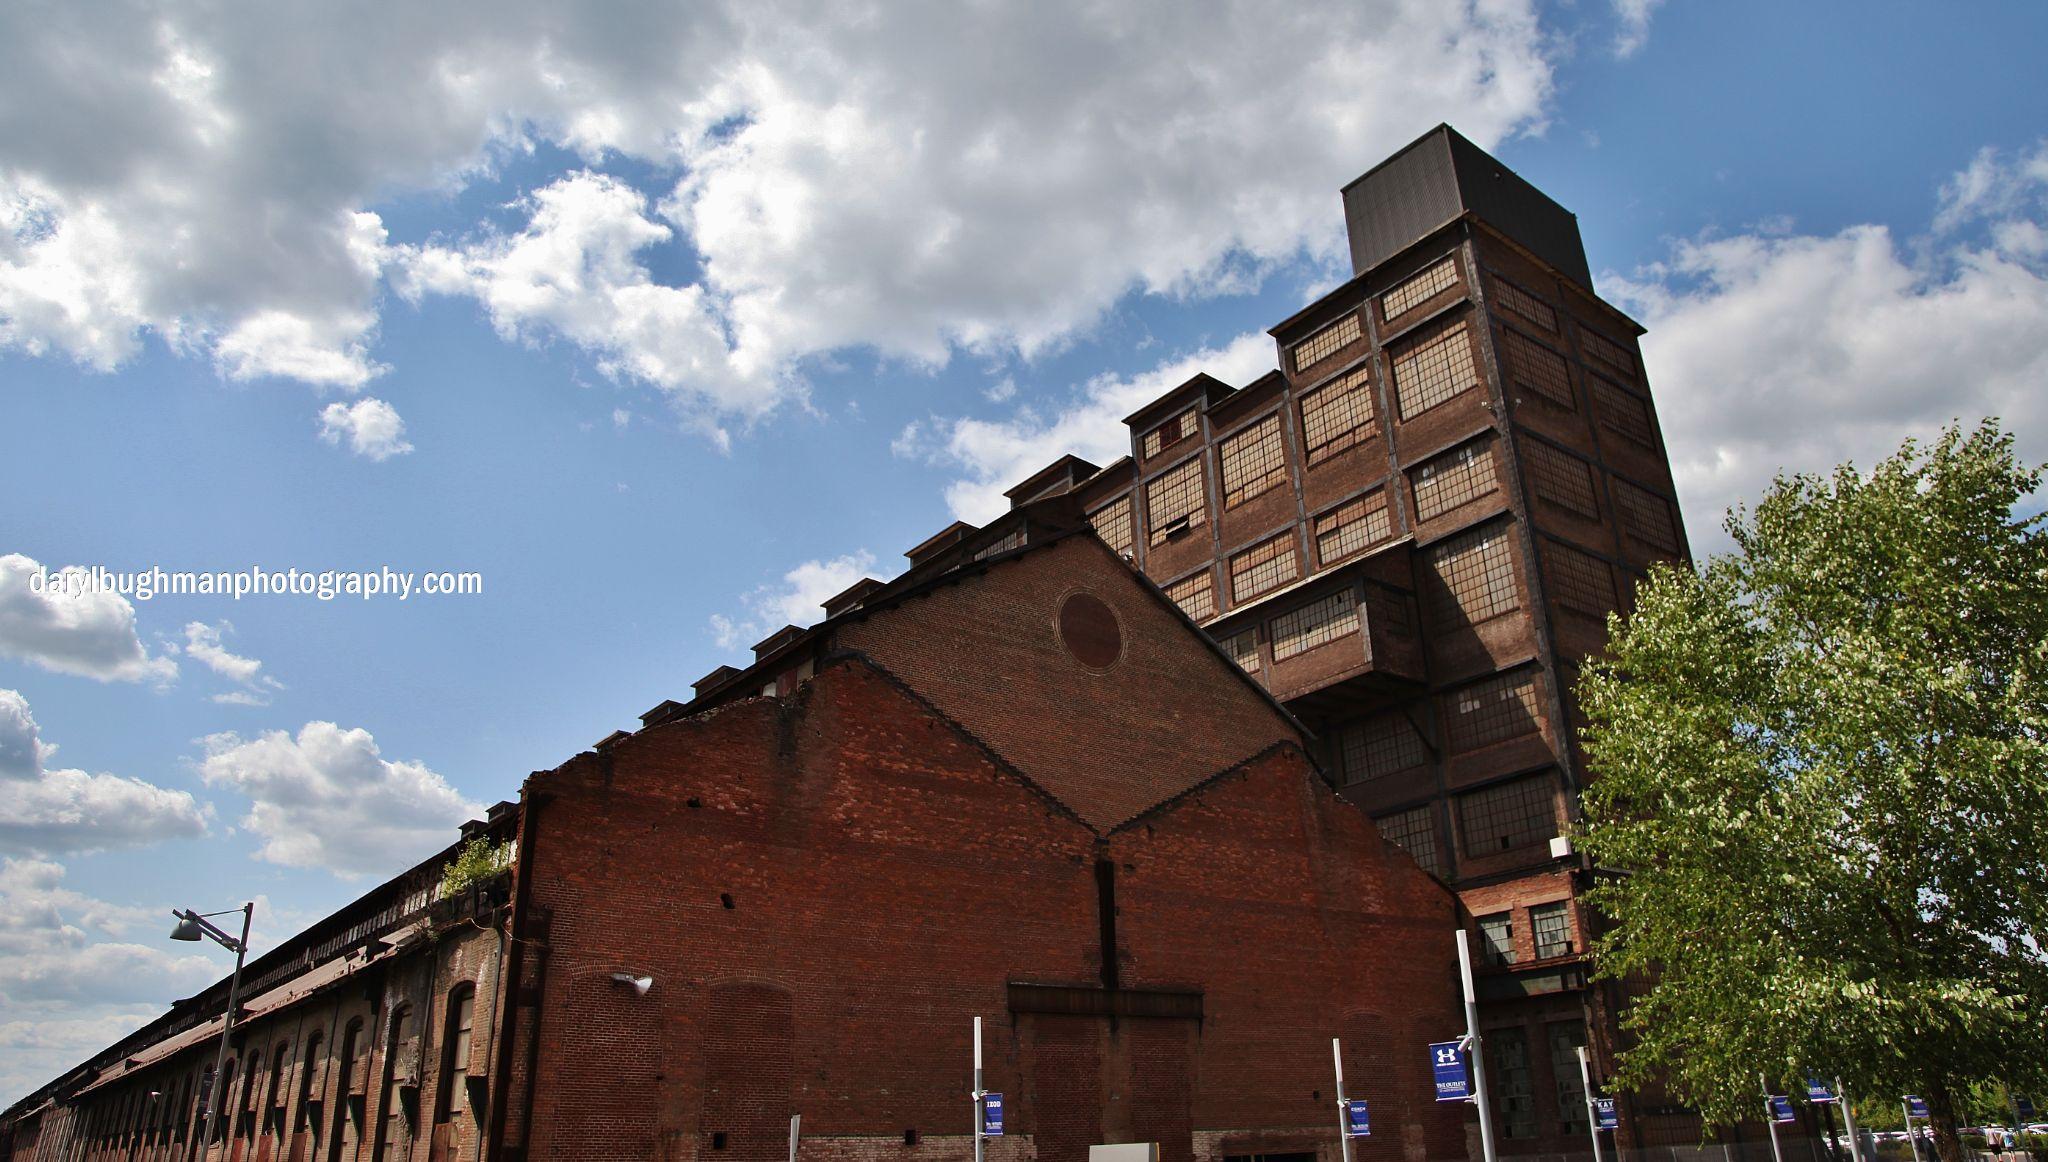 steel mill by daryl.bughman